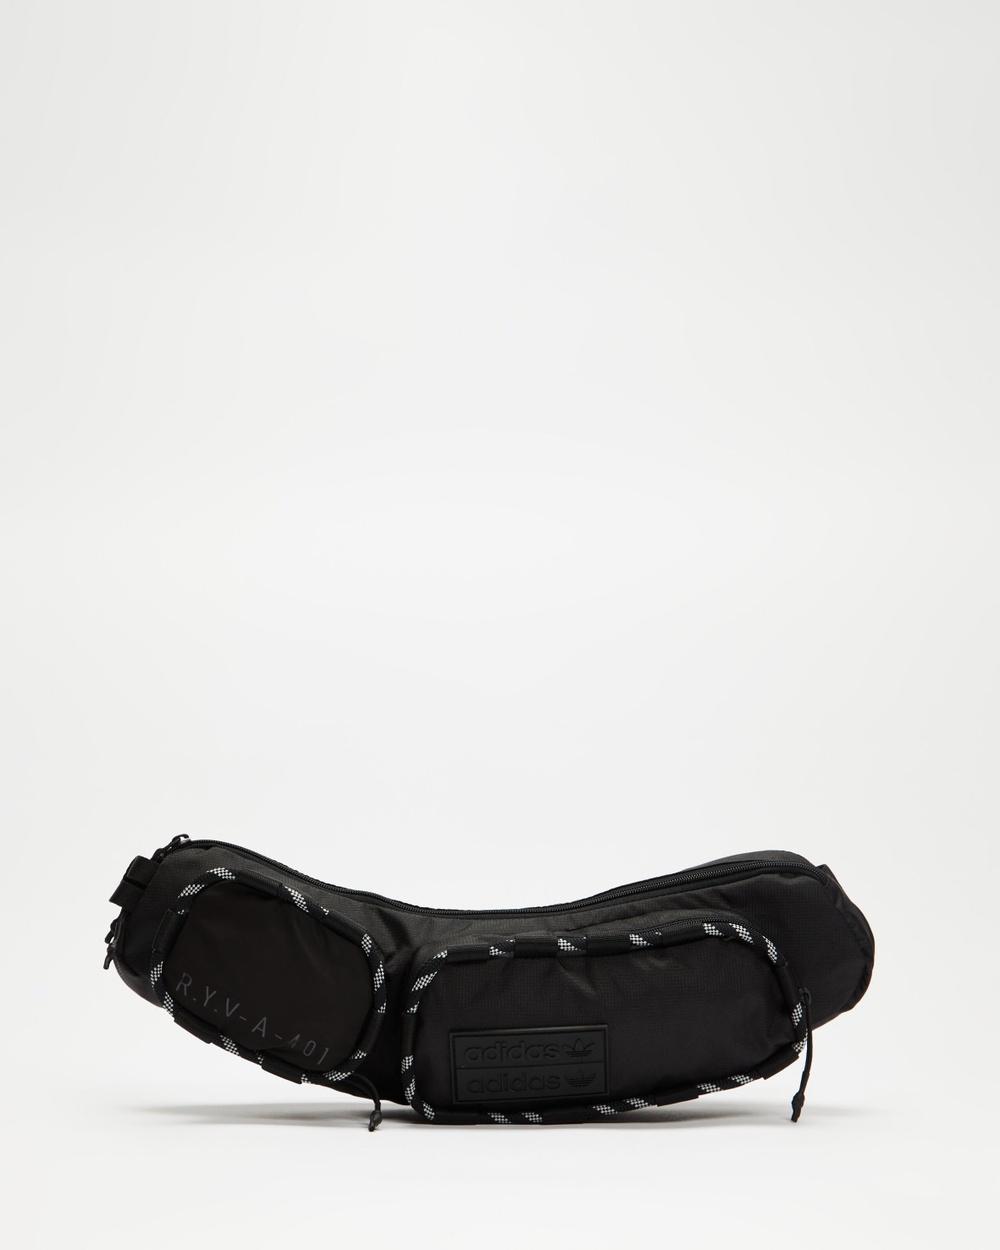 adidas Originals R.Y.V Sling Bag Bum Bags Black